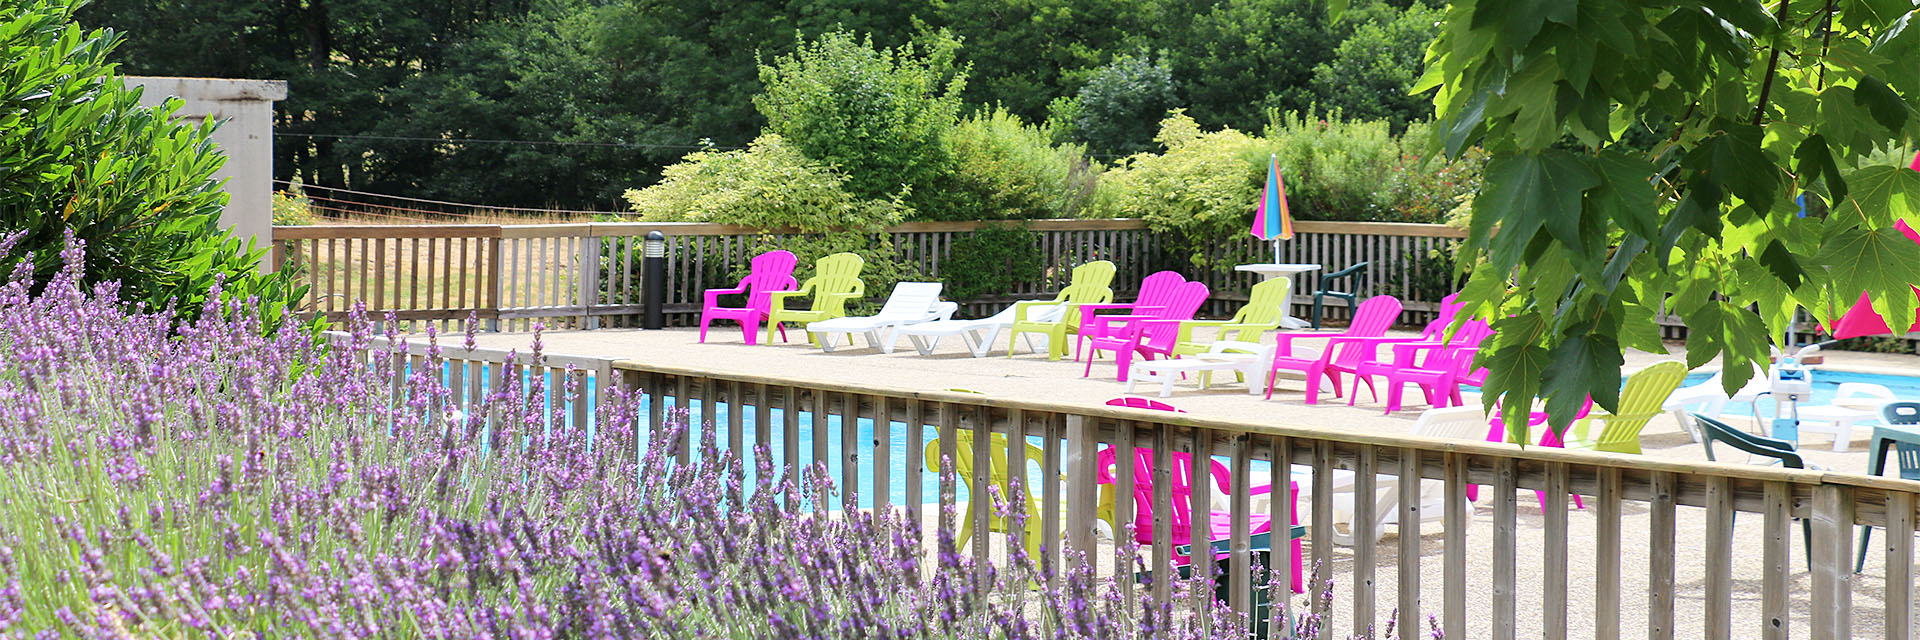 Village_club_vacances_aveyron-cantal-ardèche-fleurs-aubrac-terrasse